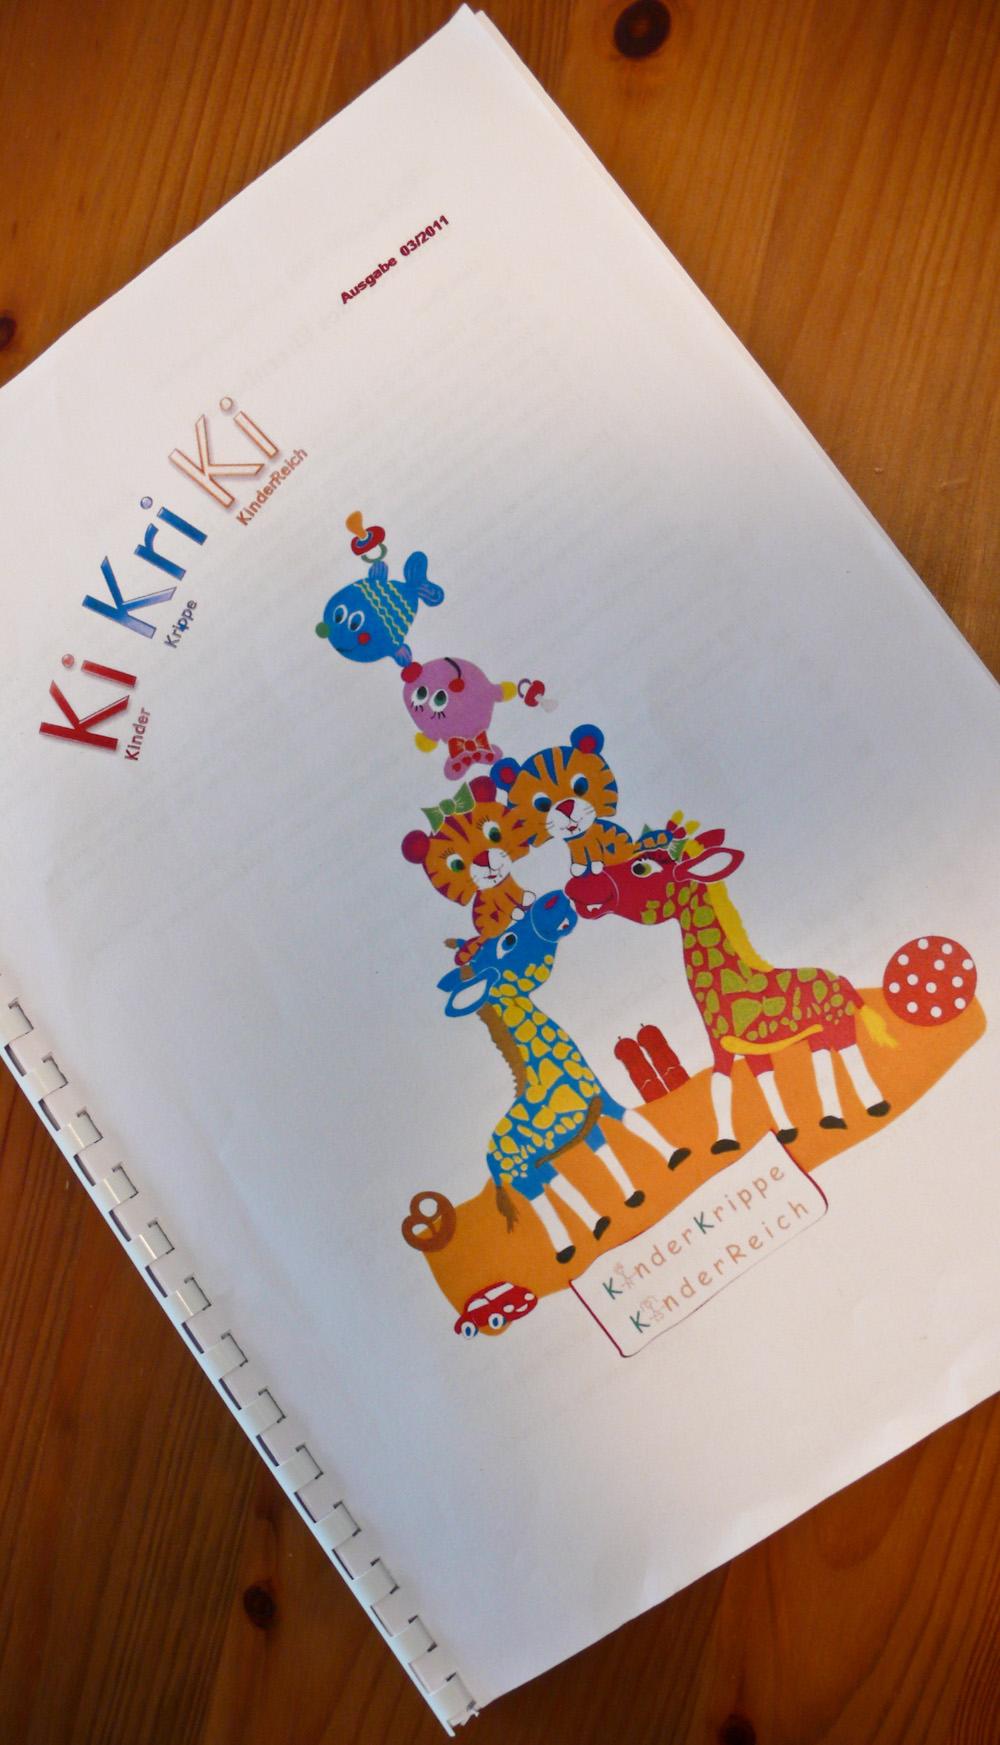 sprechen lernen Archive - KinderApp.com